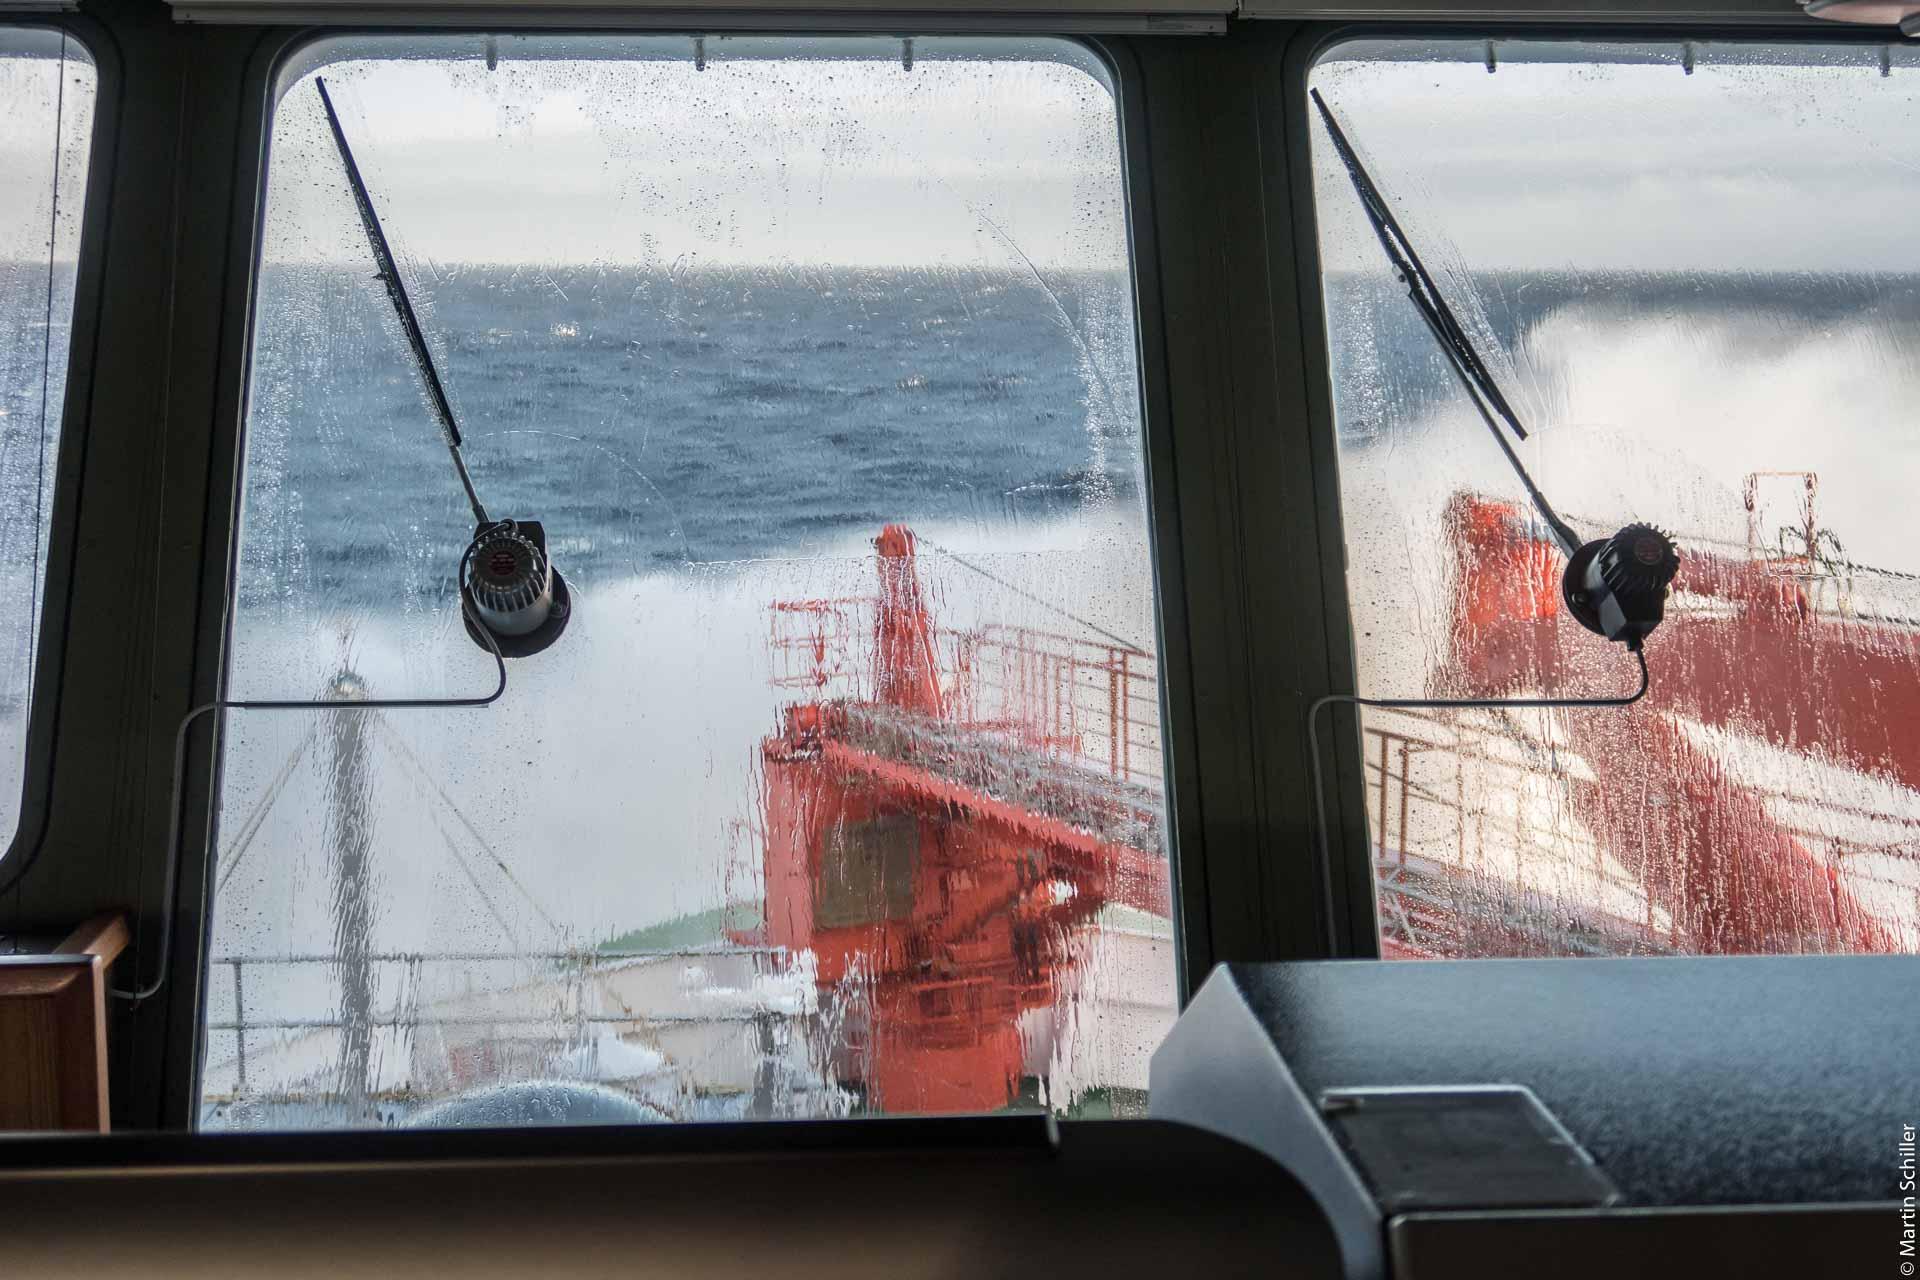 7 Beaufort in der Barentssee